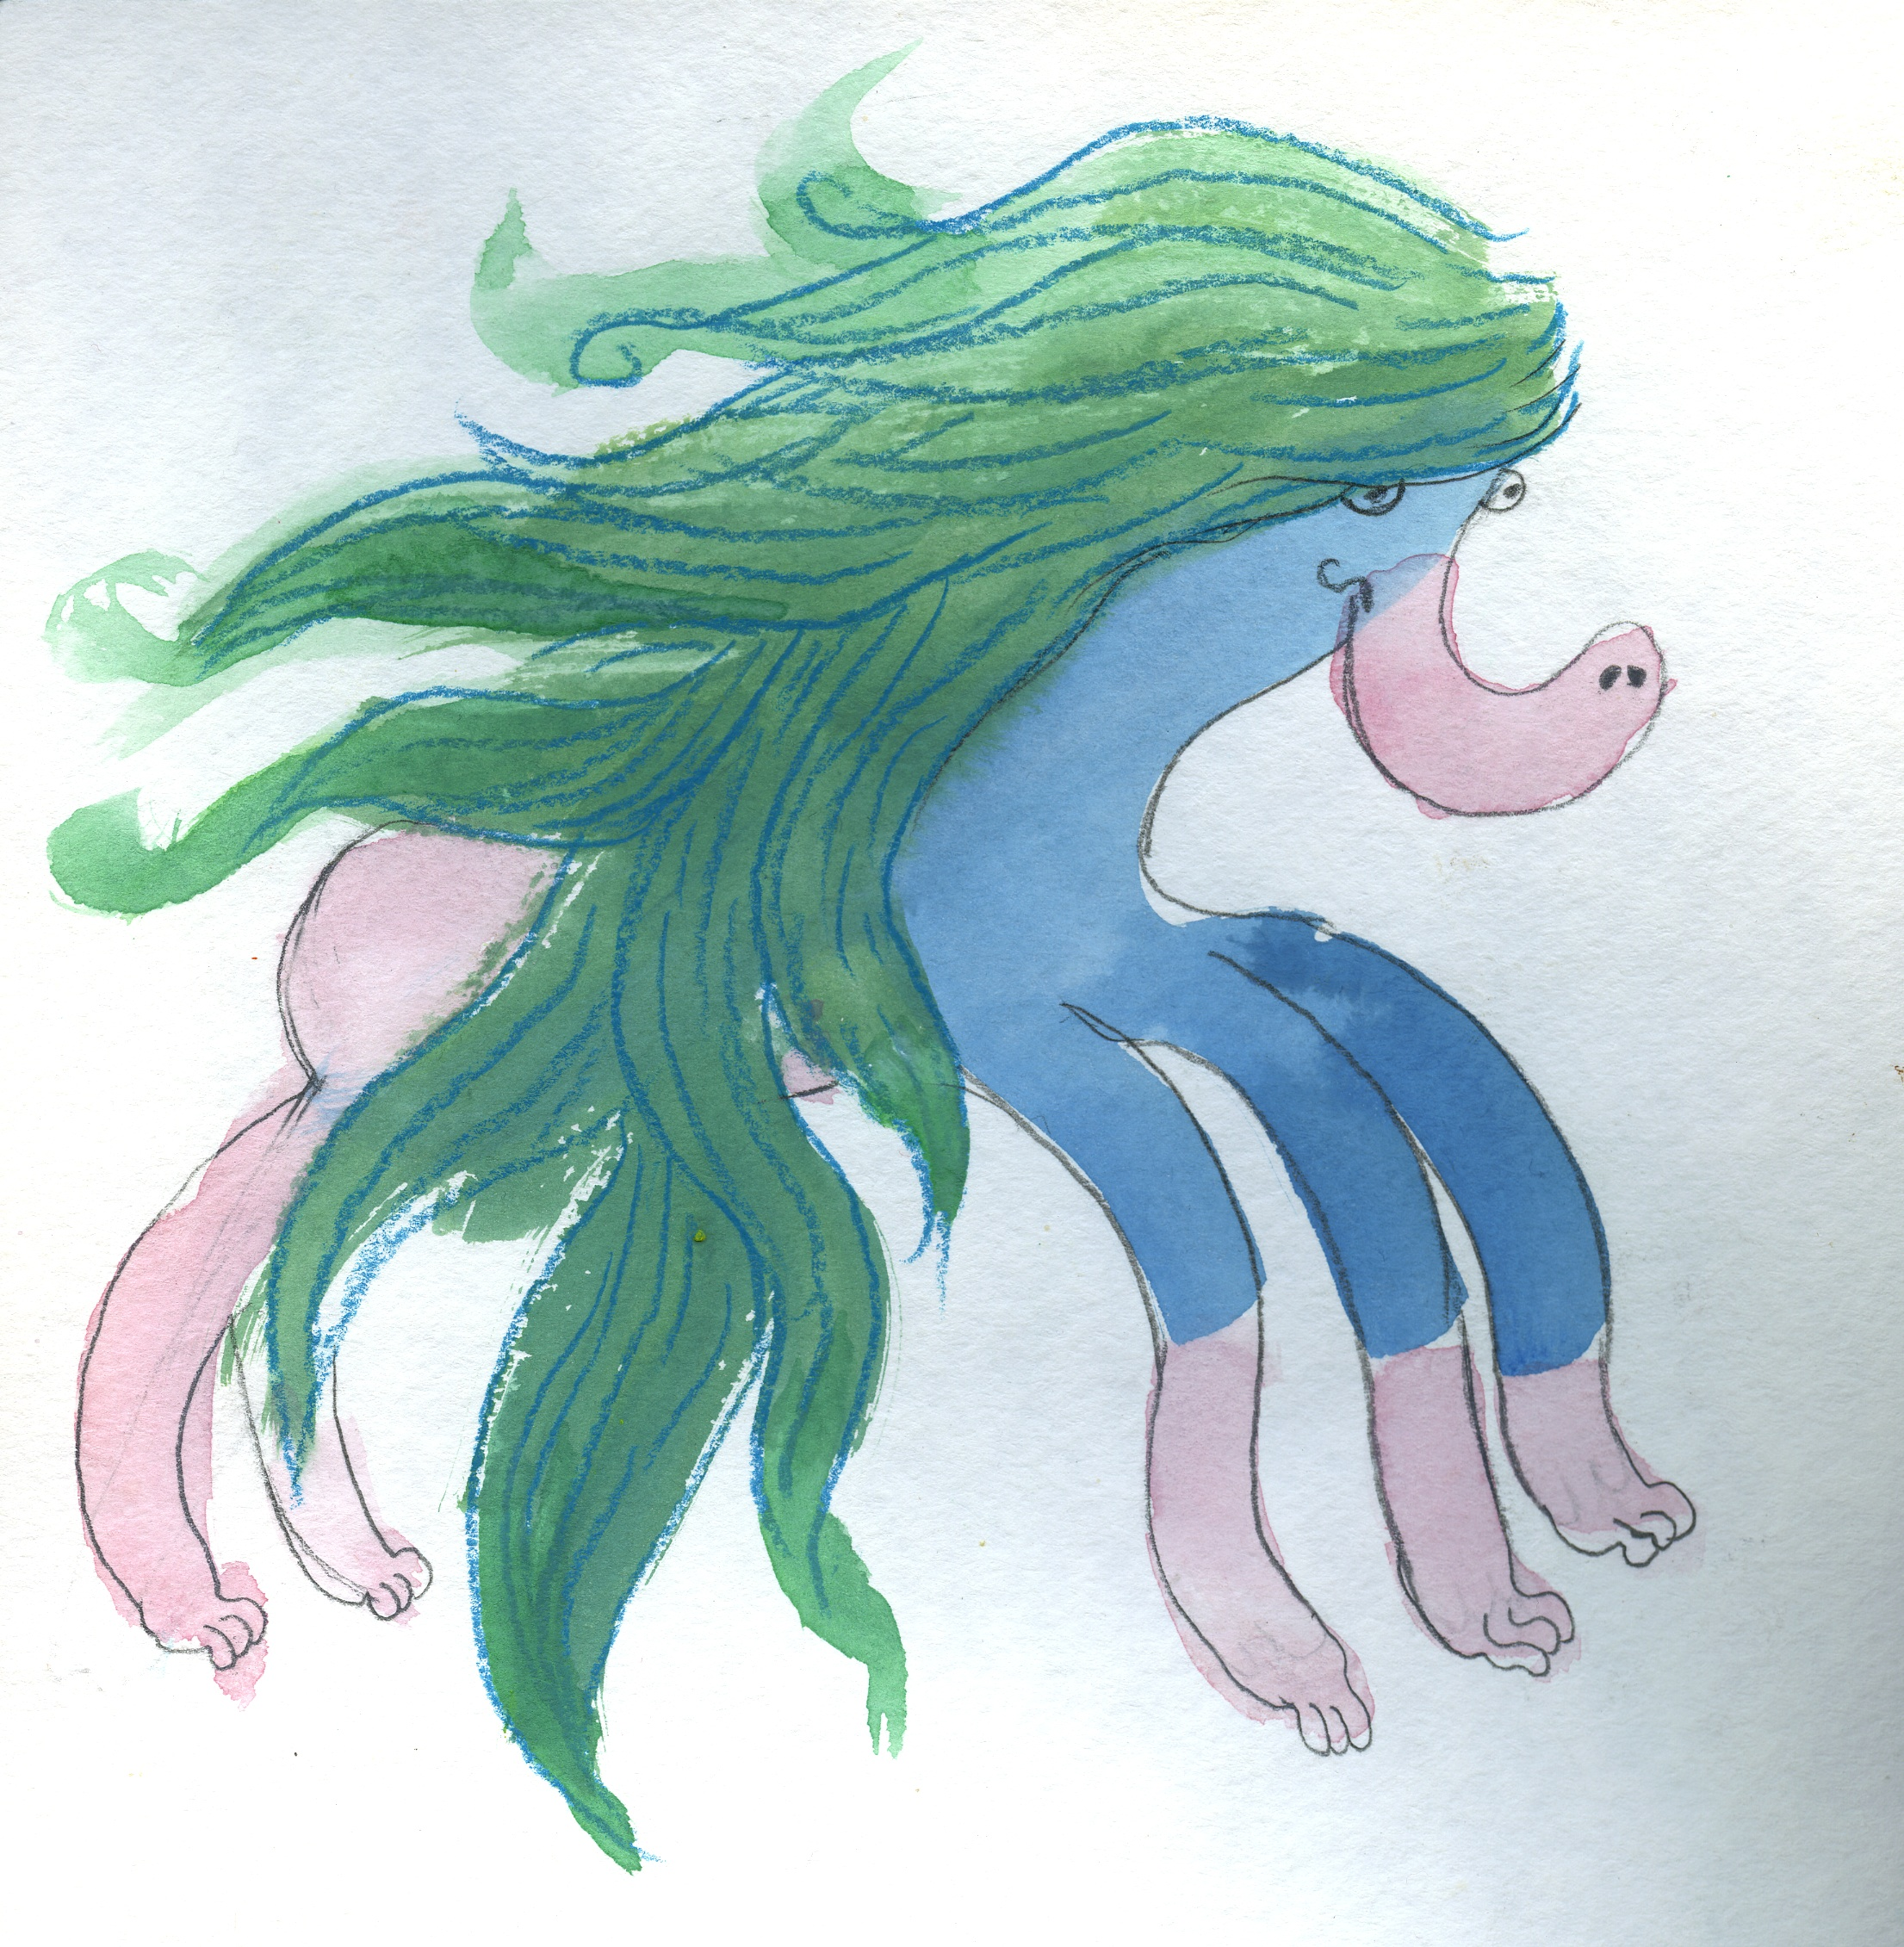 Monster 4 Sketch